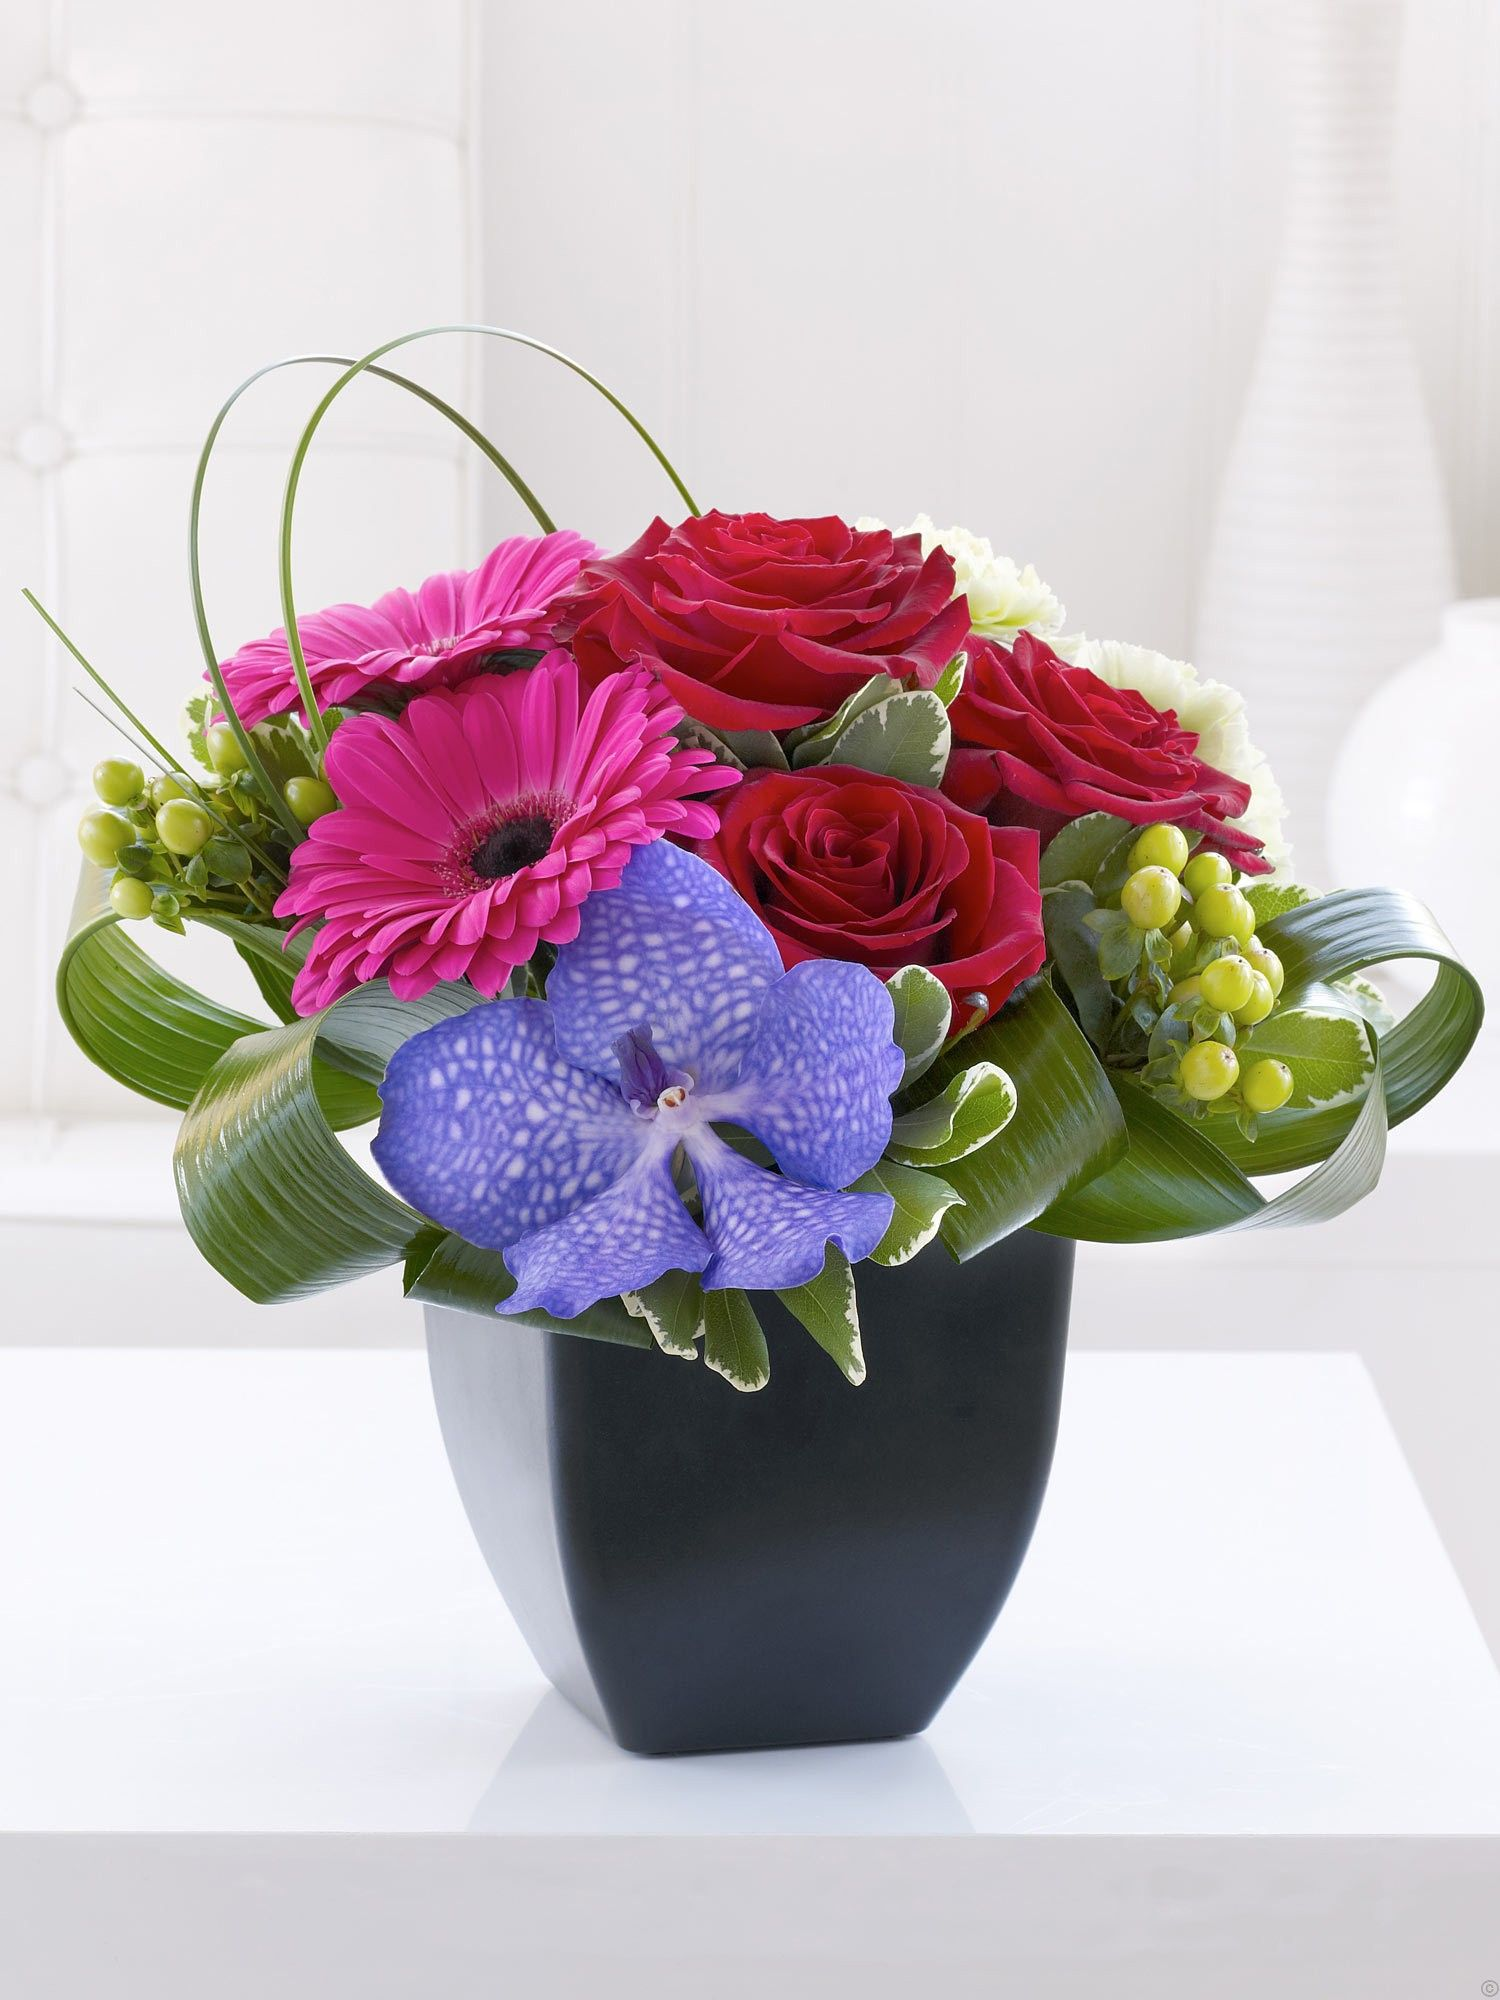 Rose gerbera and vanda orchid arrangement lifestyle collection rose gerbera and vanda orchid arrangement izmirmasajfo